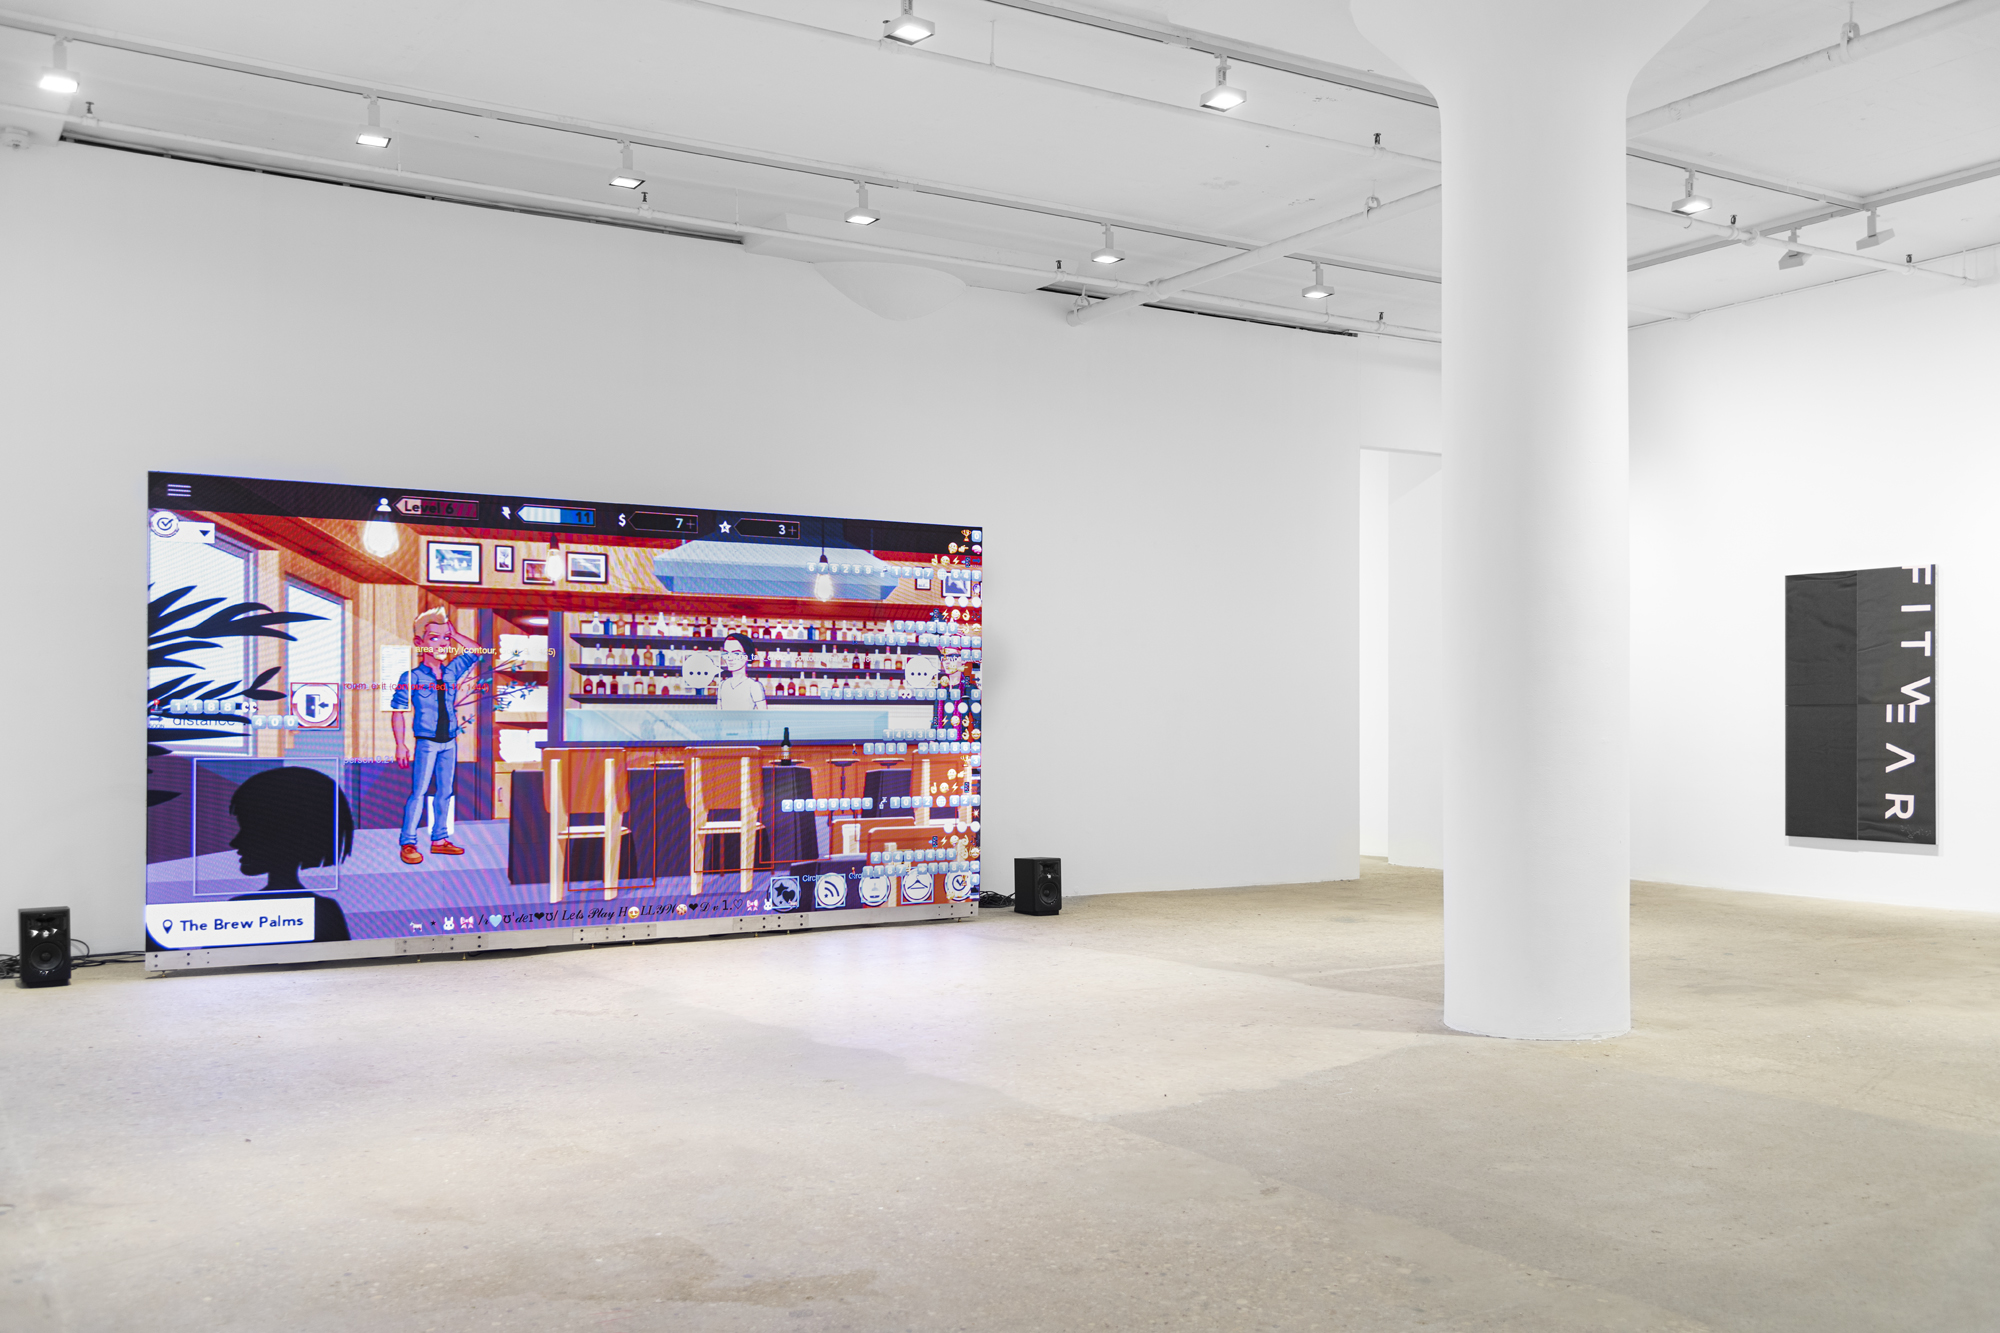 Cory Arcangel, Installation view, Century 21, Greene Naftali, New York, 2021. Courtesy the artist and Greene Naftali, New York